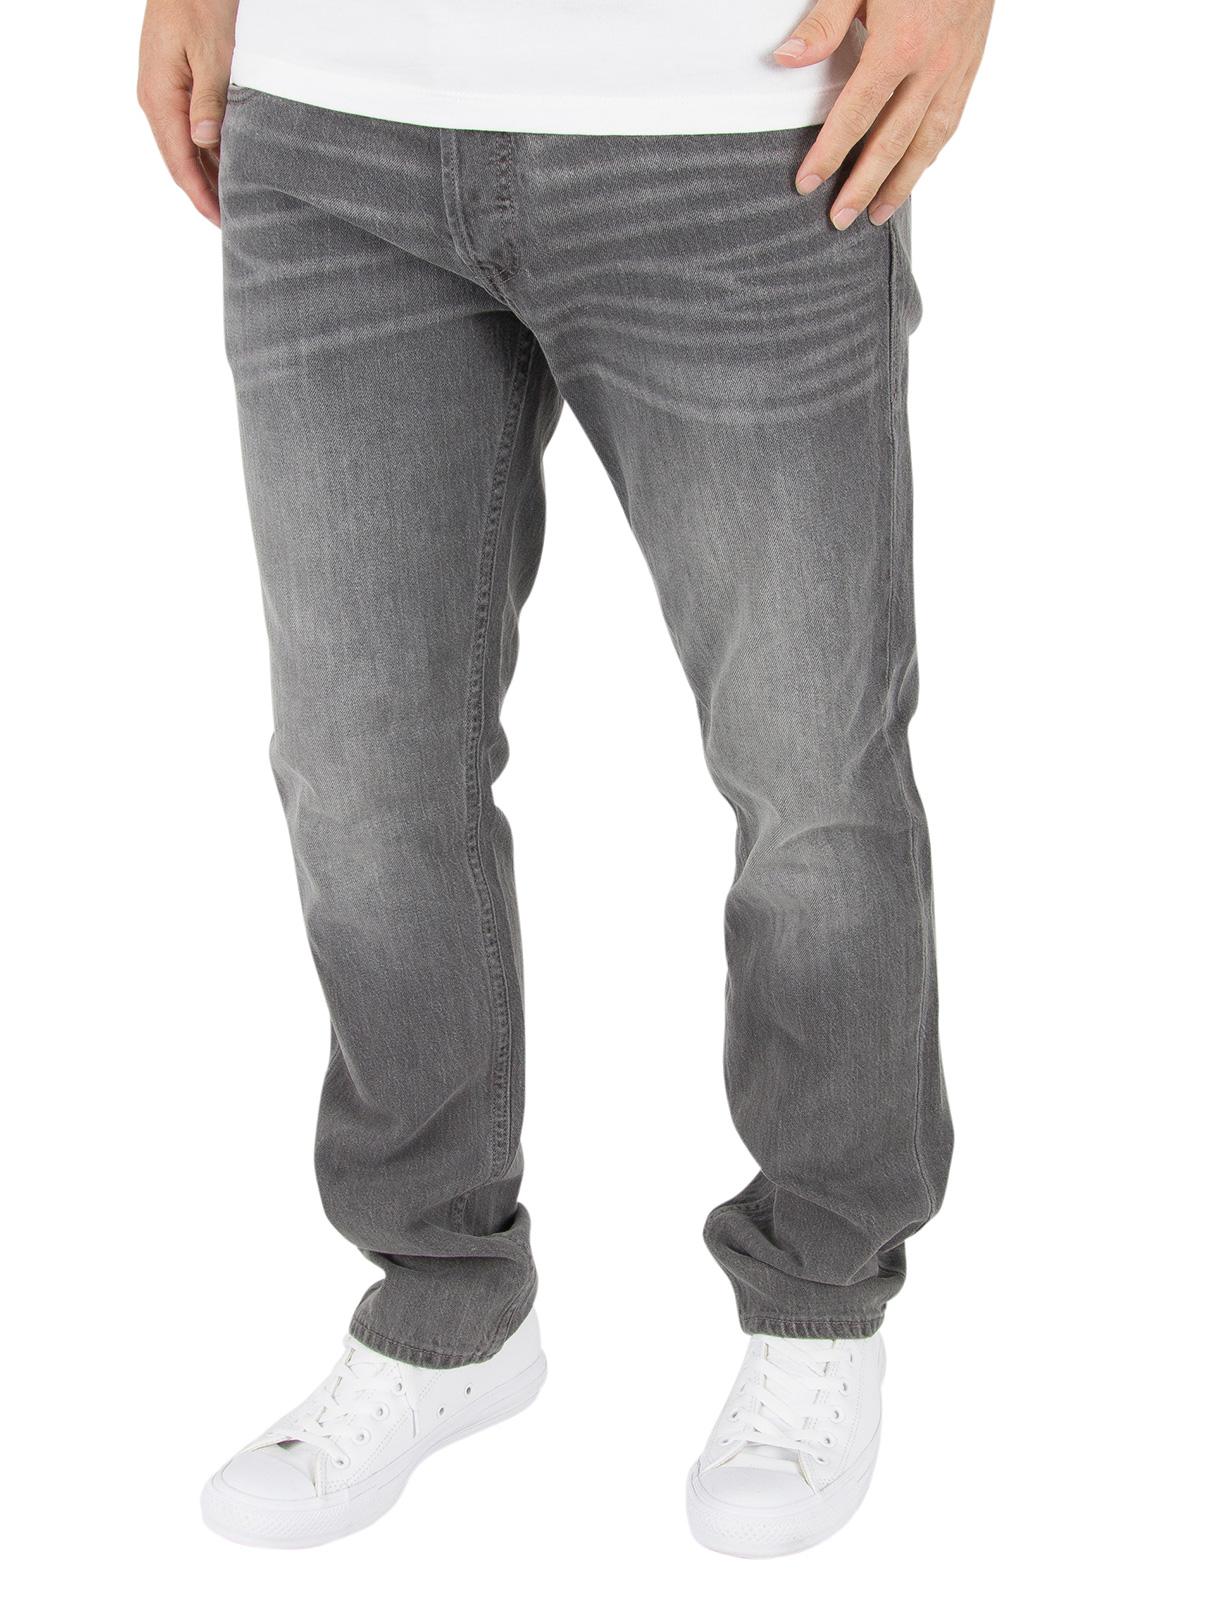 26704 TIM010JEANS 5713616345612. jack & jones tim original 010 slim fit  jeans